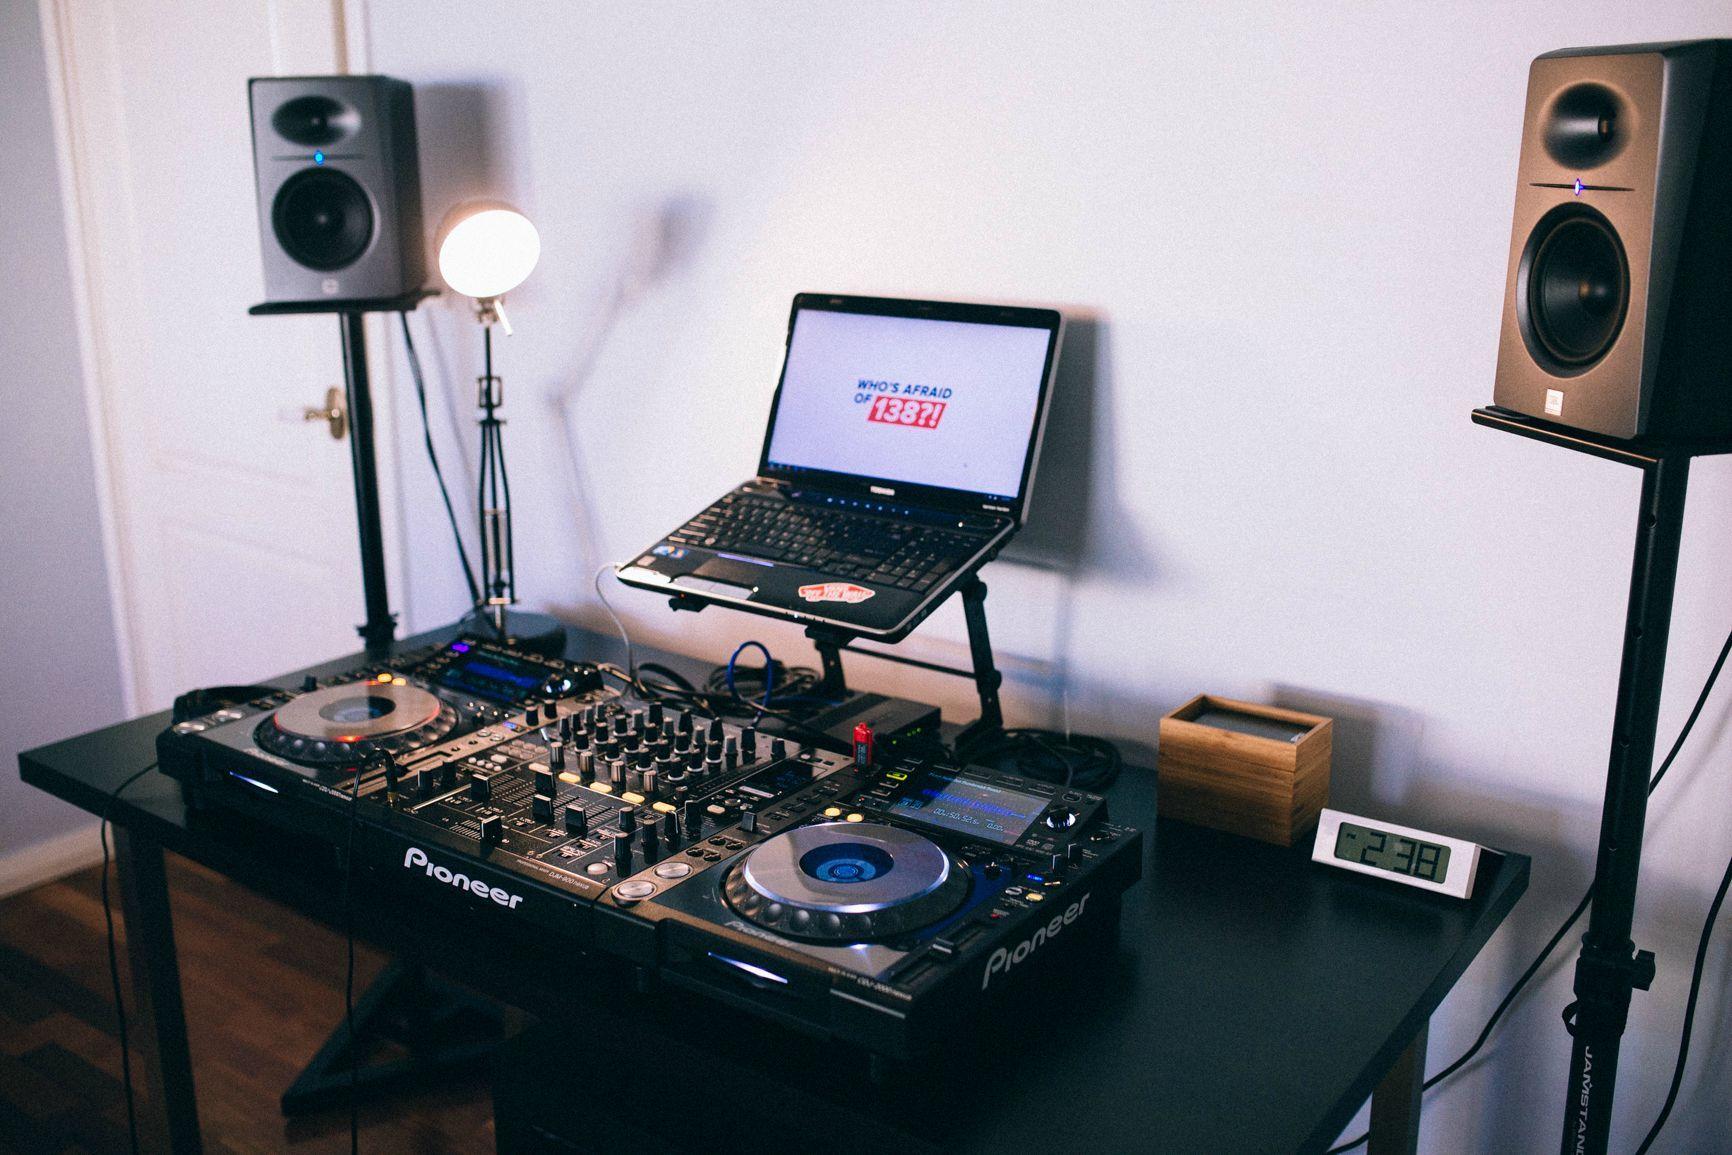 pin by owen mcfadden on djing djing equipment dj equipment dj equipment for sale dj music. Black Bedroom Furniture Sets. Home Design Ideas